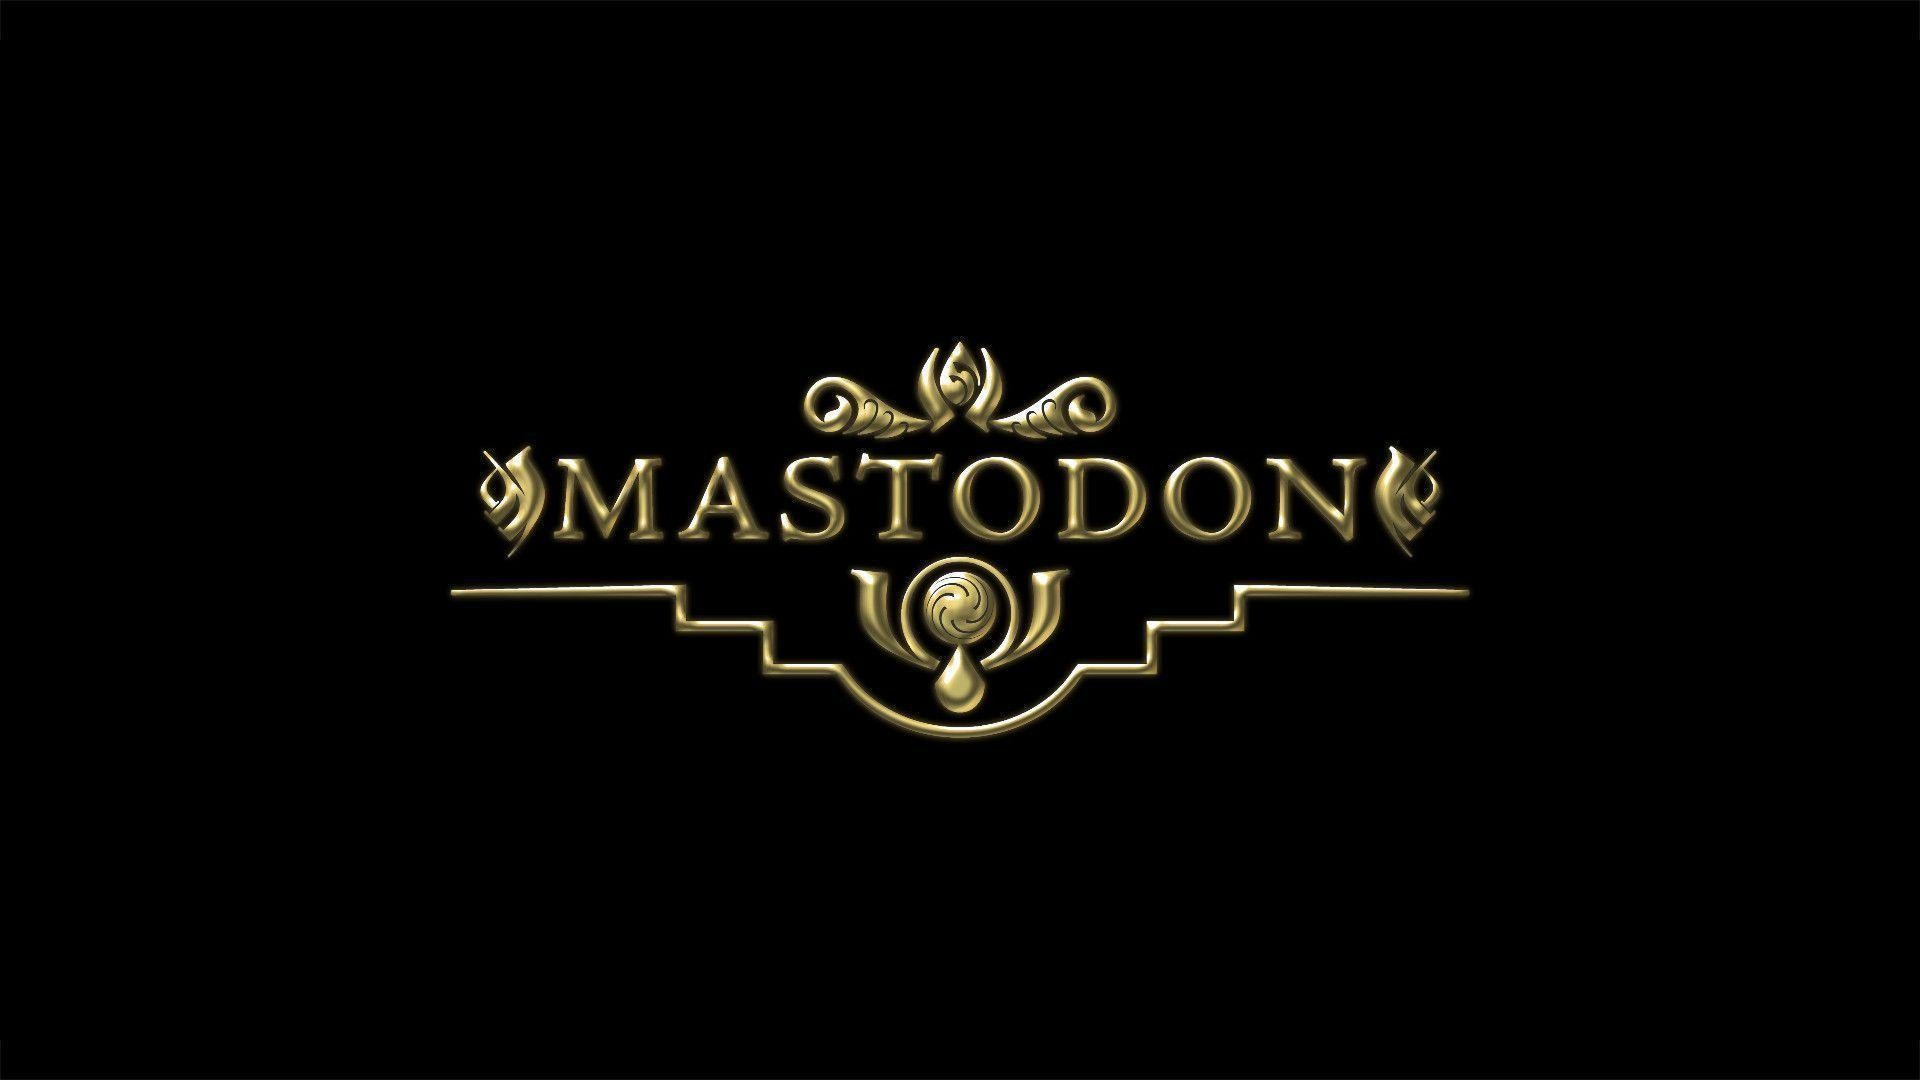 Res: 1920x1080, Mastodon Wallpapers - Wallpaper Cave Mastodon Wallpaper